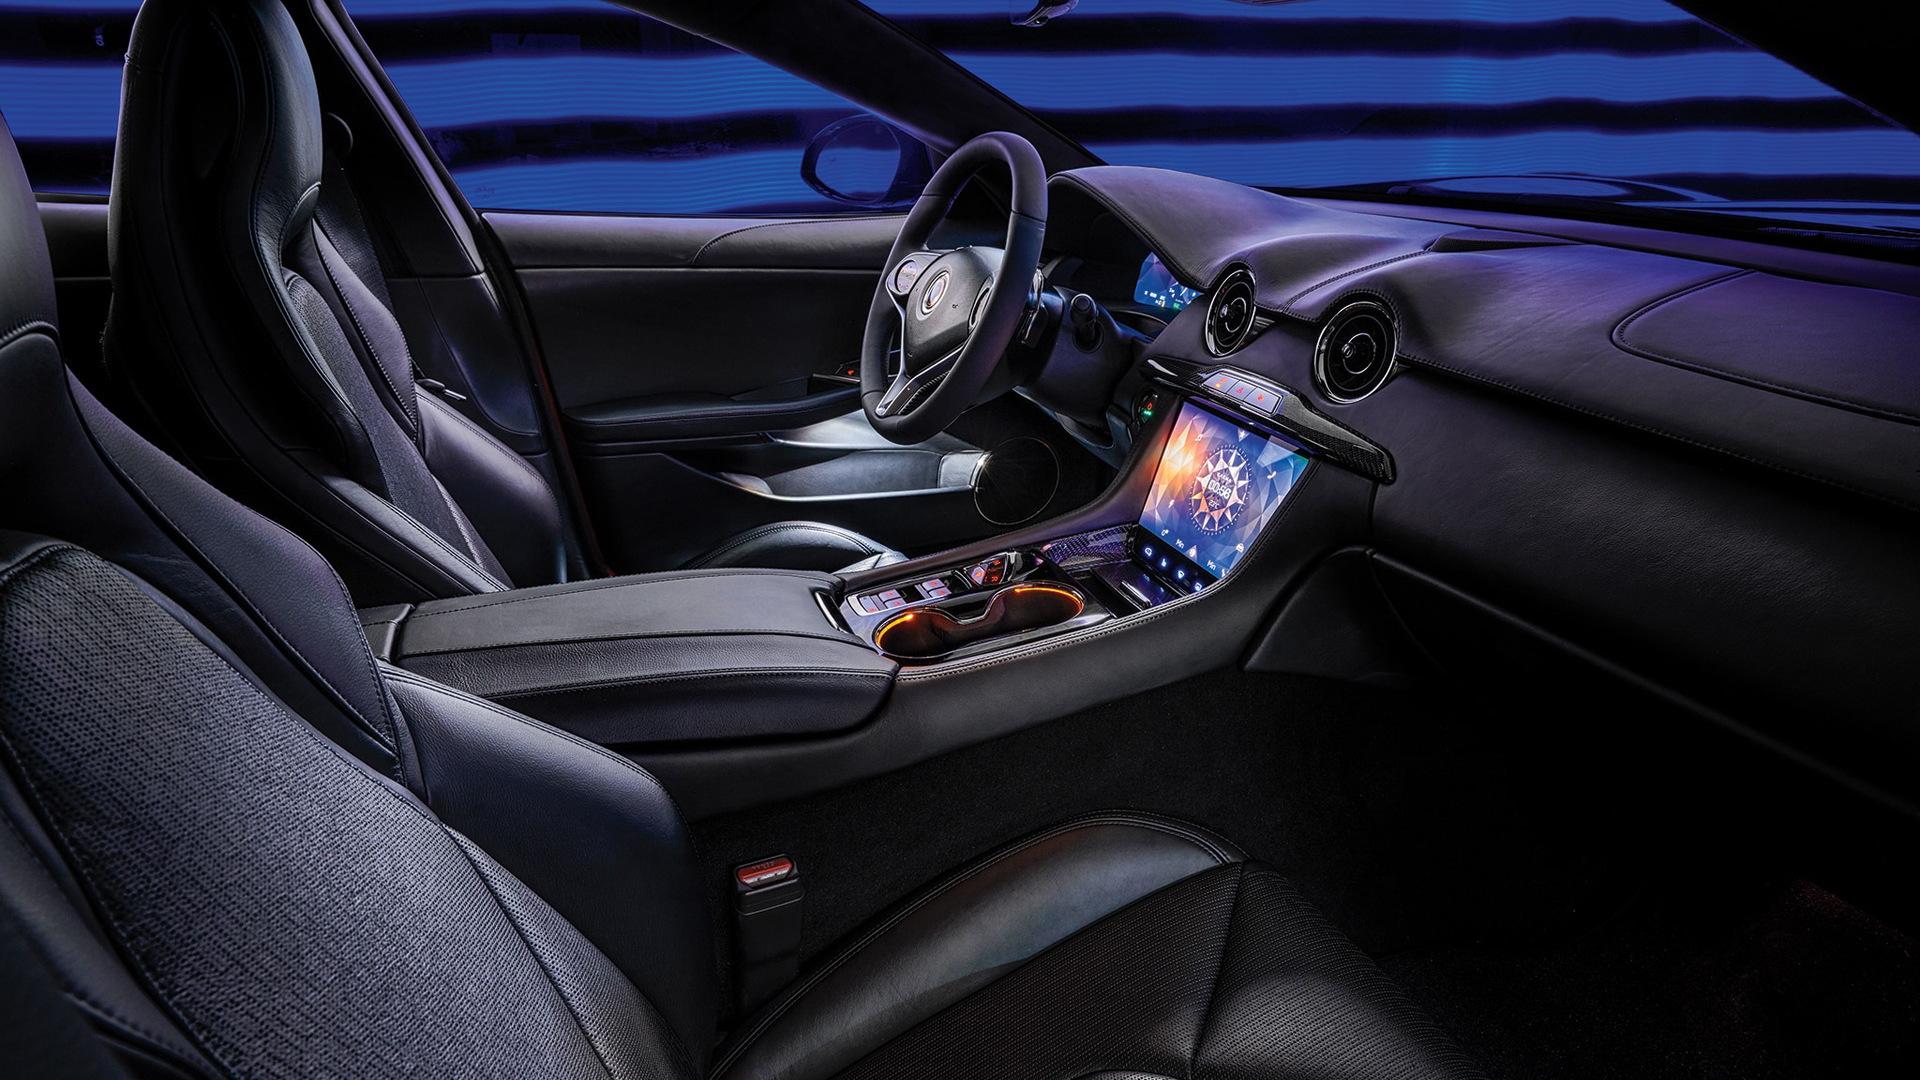 Karma reveals 2020 Revero GT with new battery, BMW engine